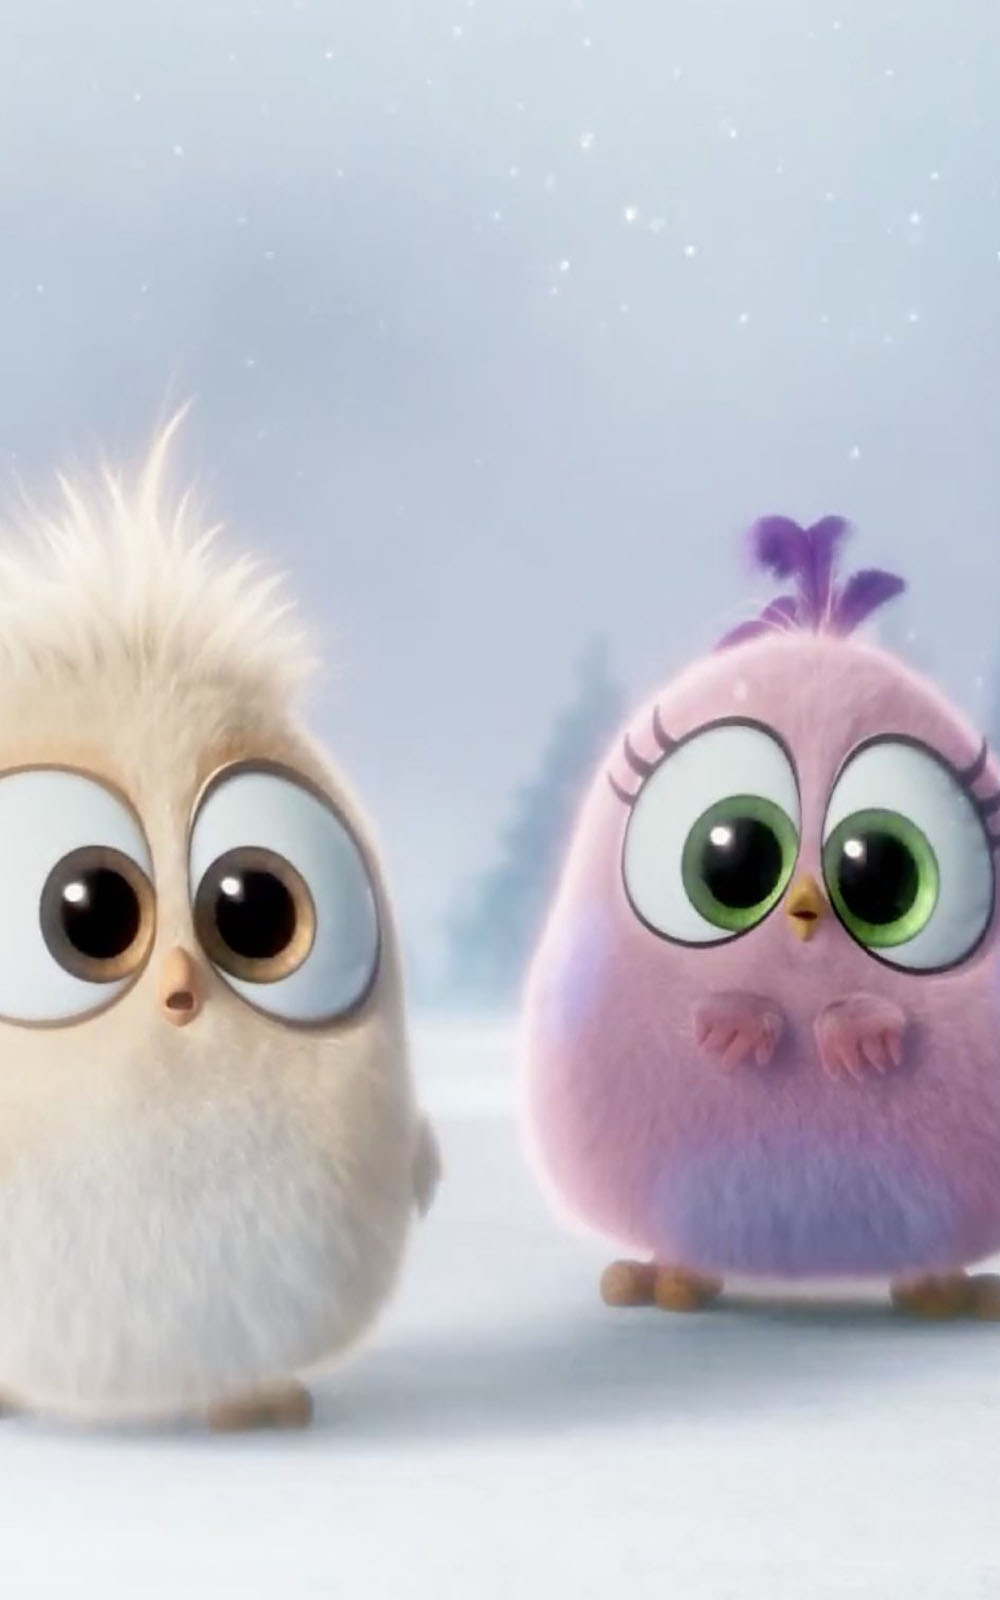 Cute Pics For Wallpaper Snowy Owl Owl Pink Cartoon Purple 999684 Wallpaperuse